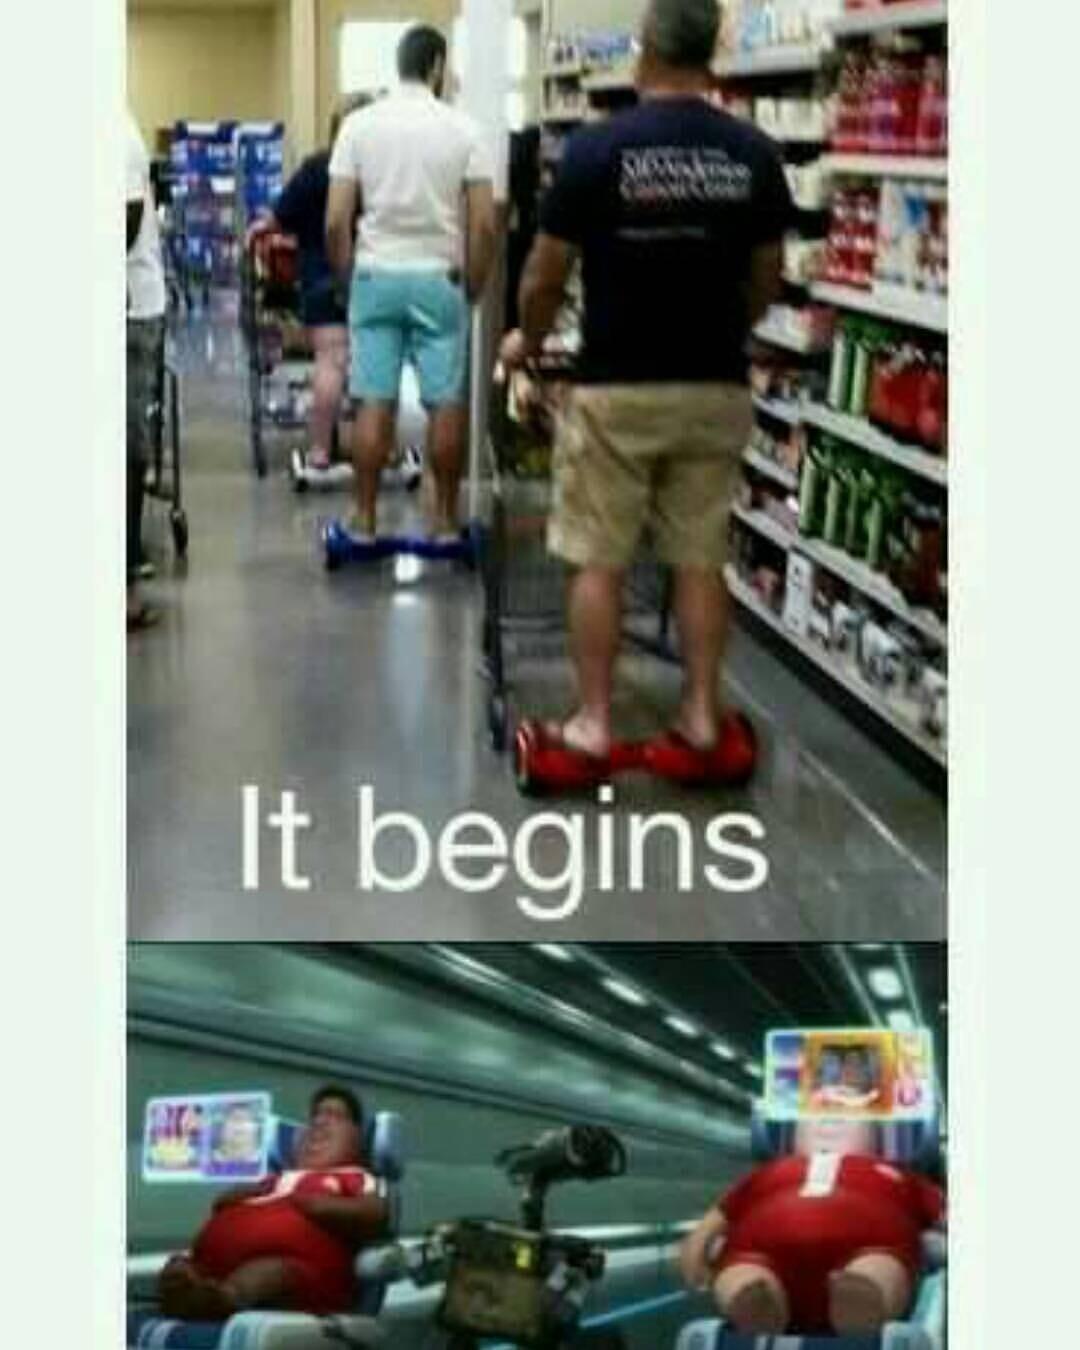 CLUB GIGGLE tumblr_nxpwqzavI41tj1uzko1_1280 30 Meanwhile In Walmart Pics That Will Blow Your Mind